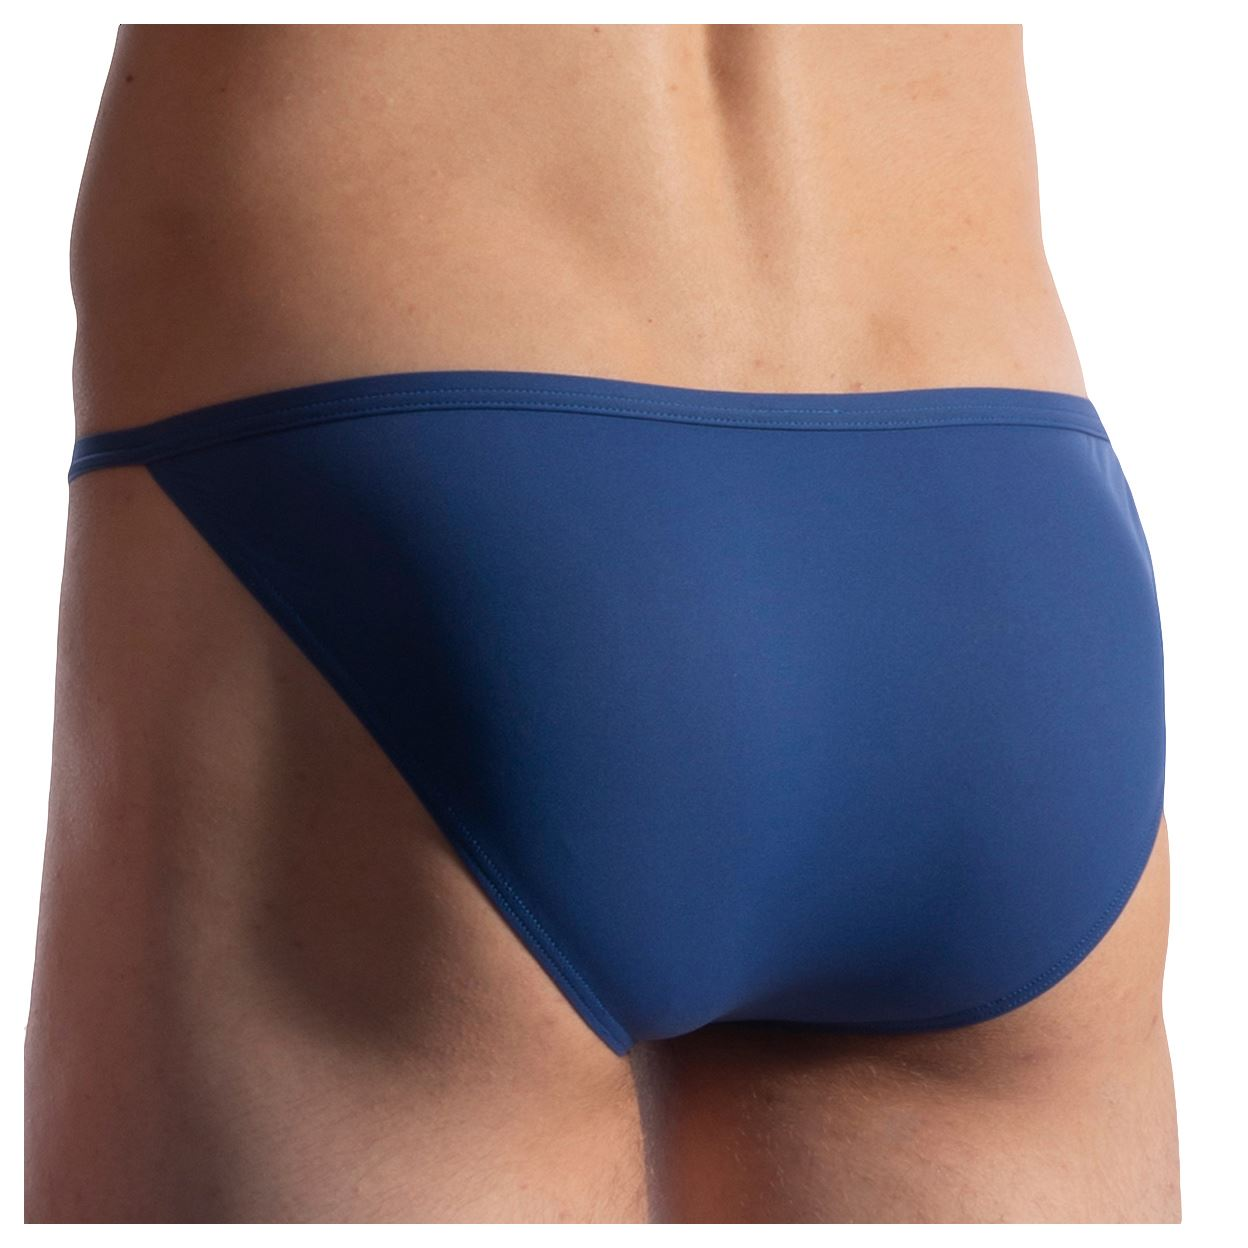 Olaf Benz Rosso 0965 rio Tanga String Lato Slip Bikini Intimo Vari Colori